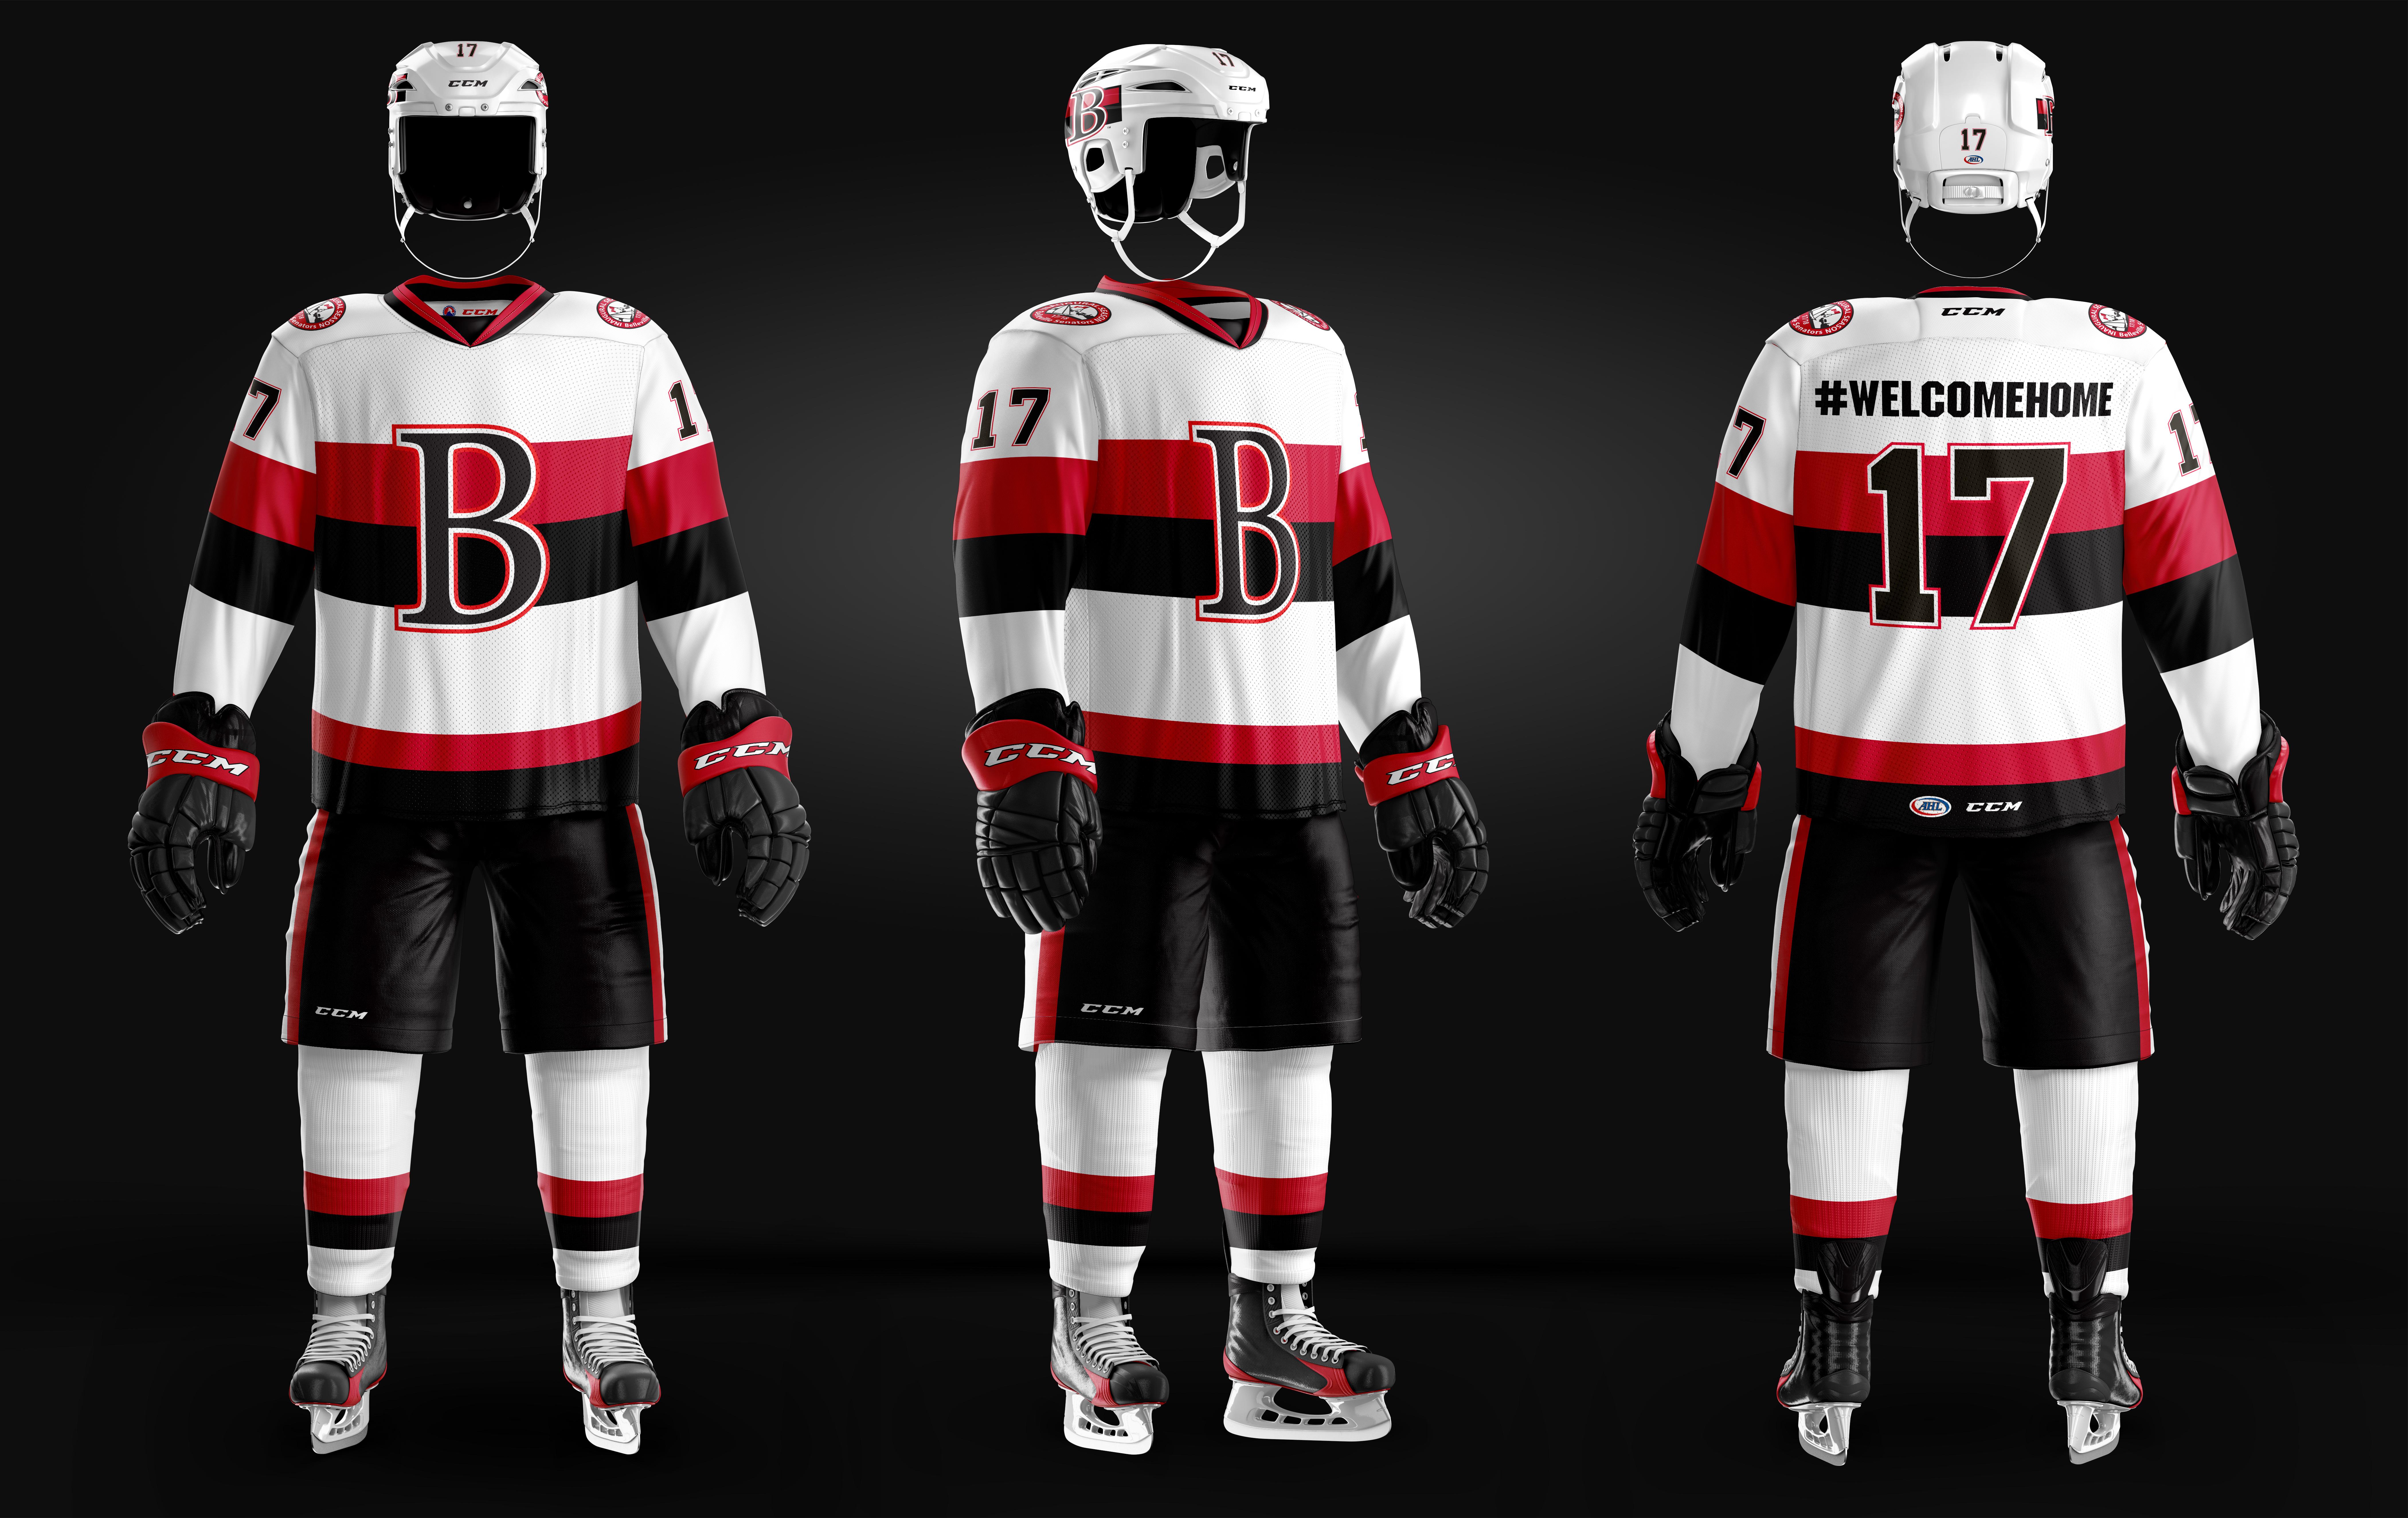 2f0bbf94b The Belleville Senators unveil their uniforms and inaugural season ...